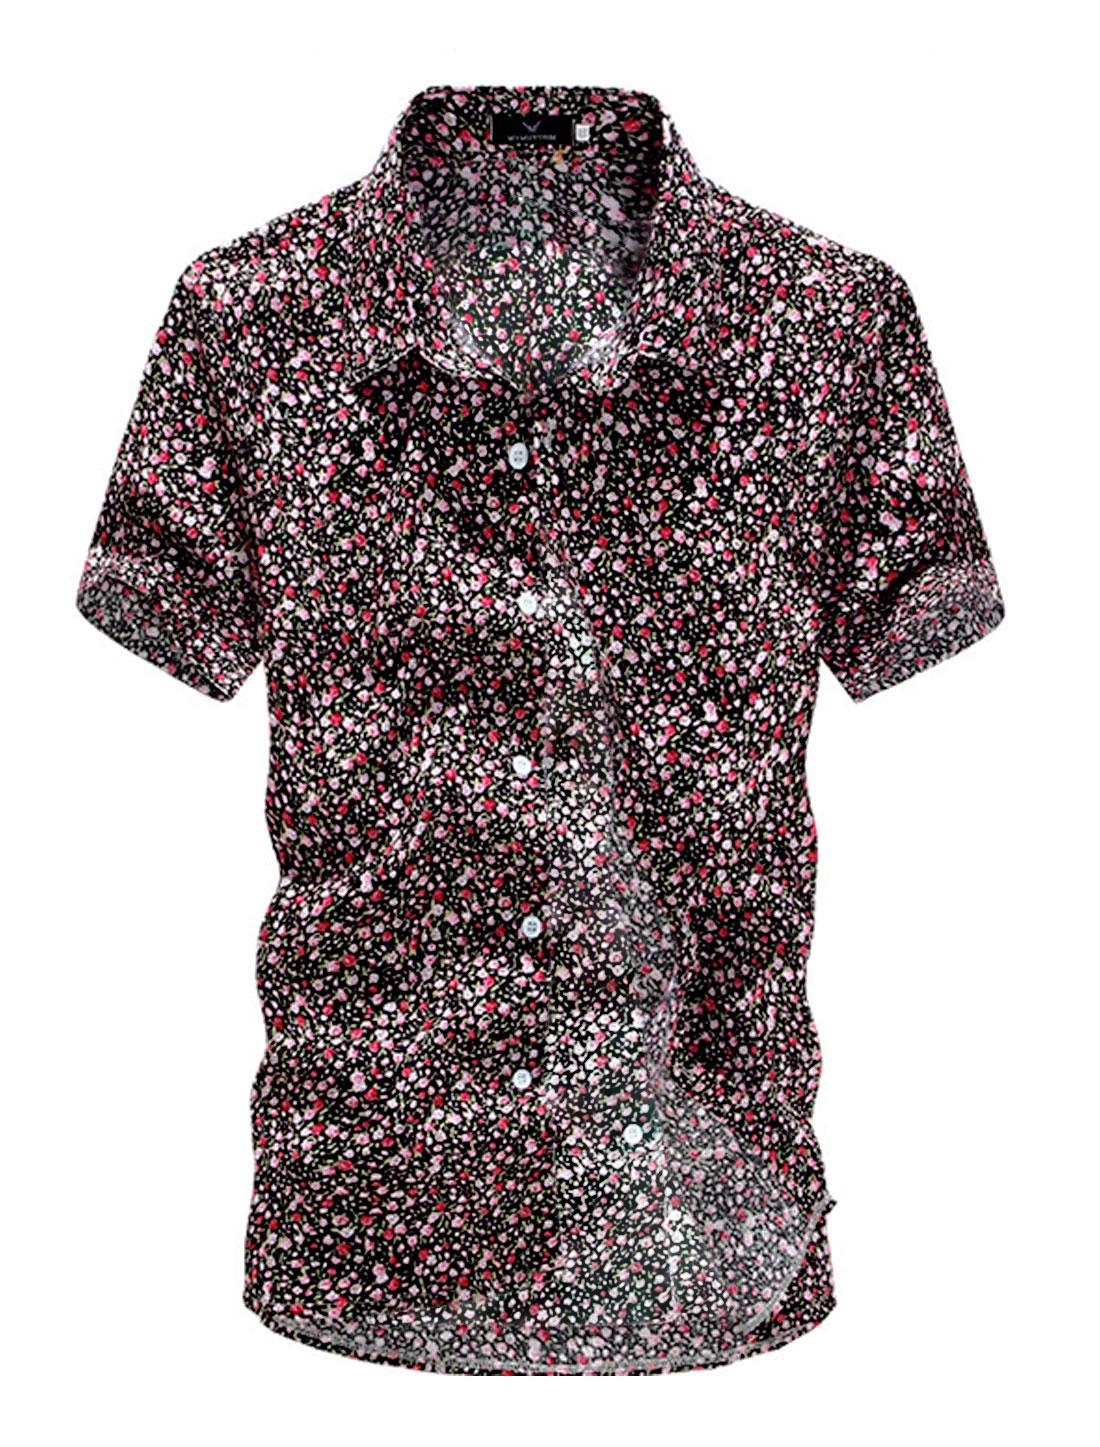 Short Sleeve Floral Prints Button Down Summer Shirt for Men Black M